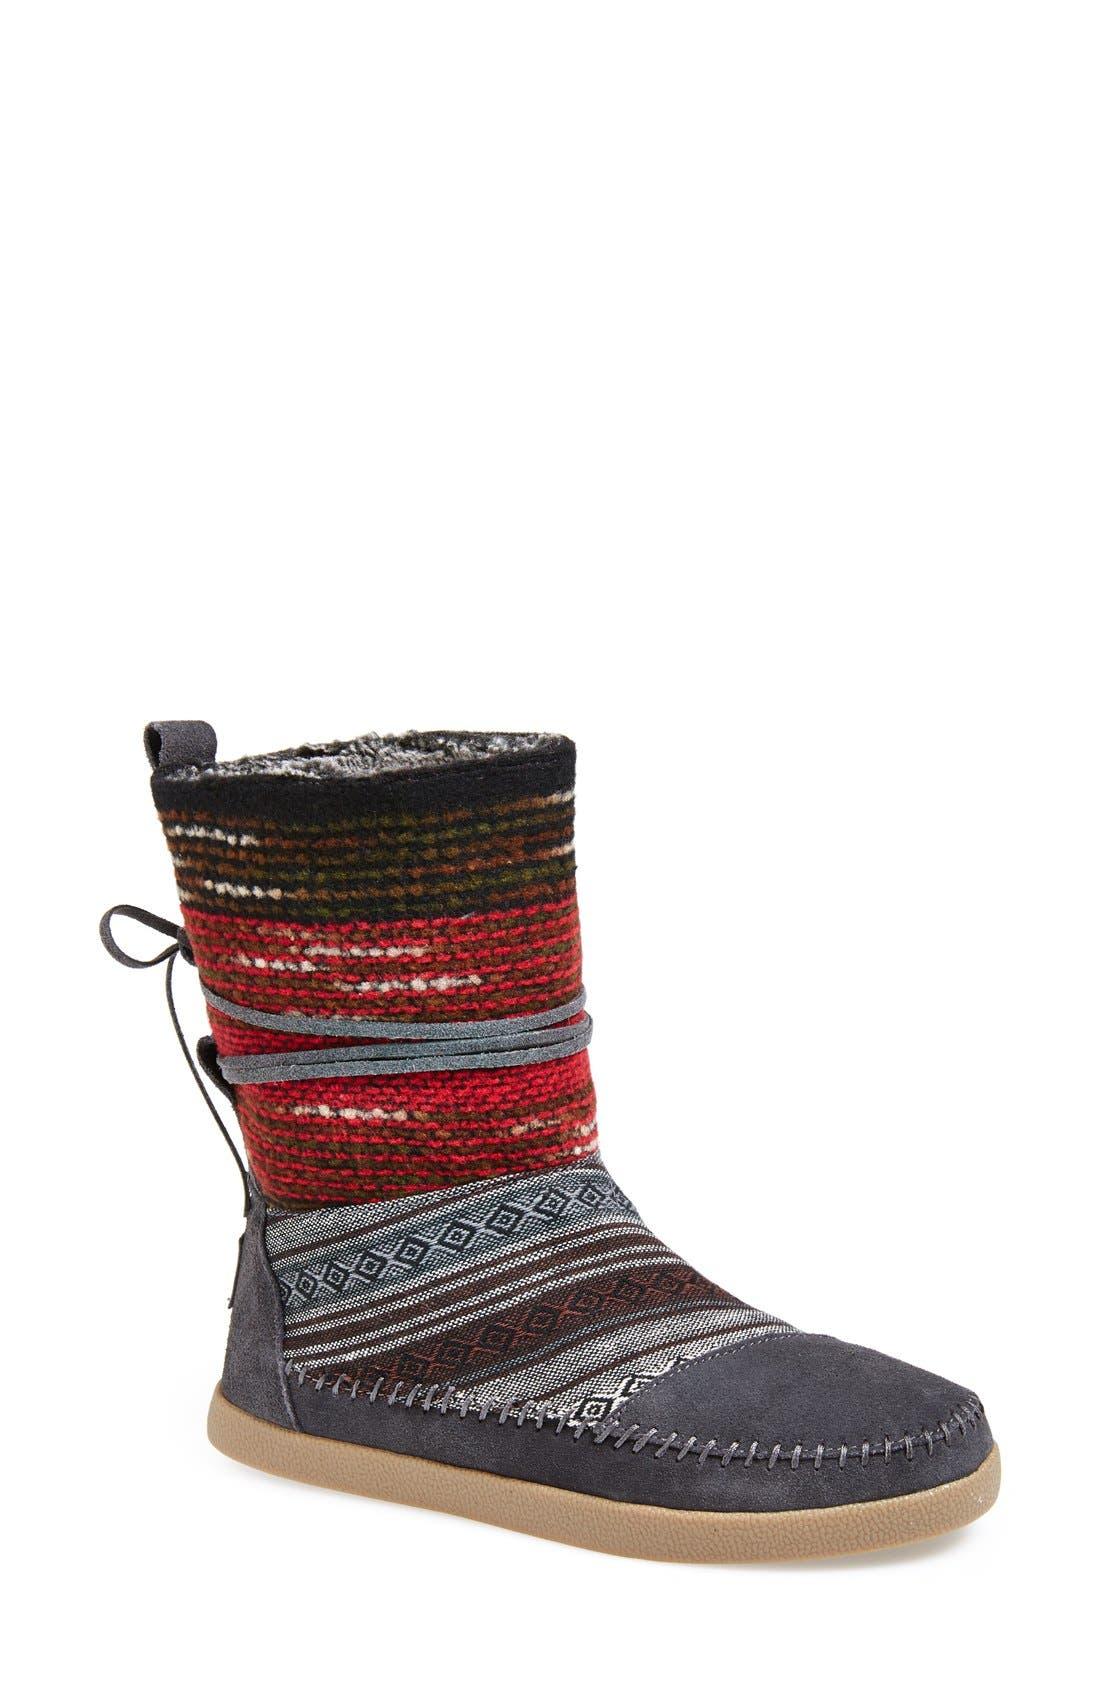 Alternate Image 1 Selected - TOMS 'Nepal' Boot (Women)